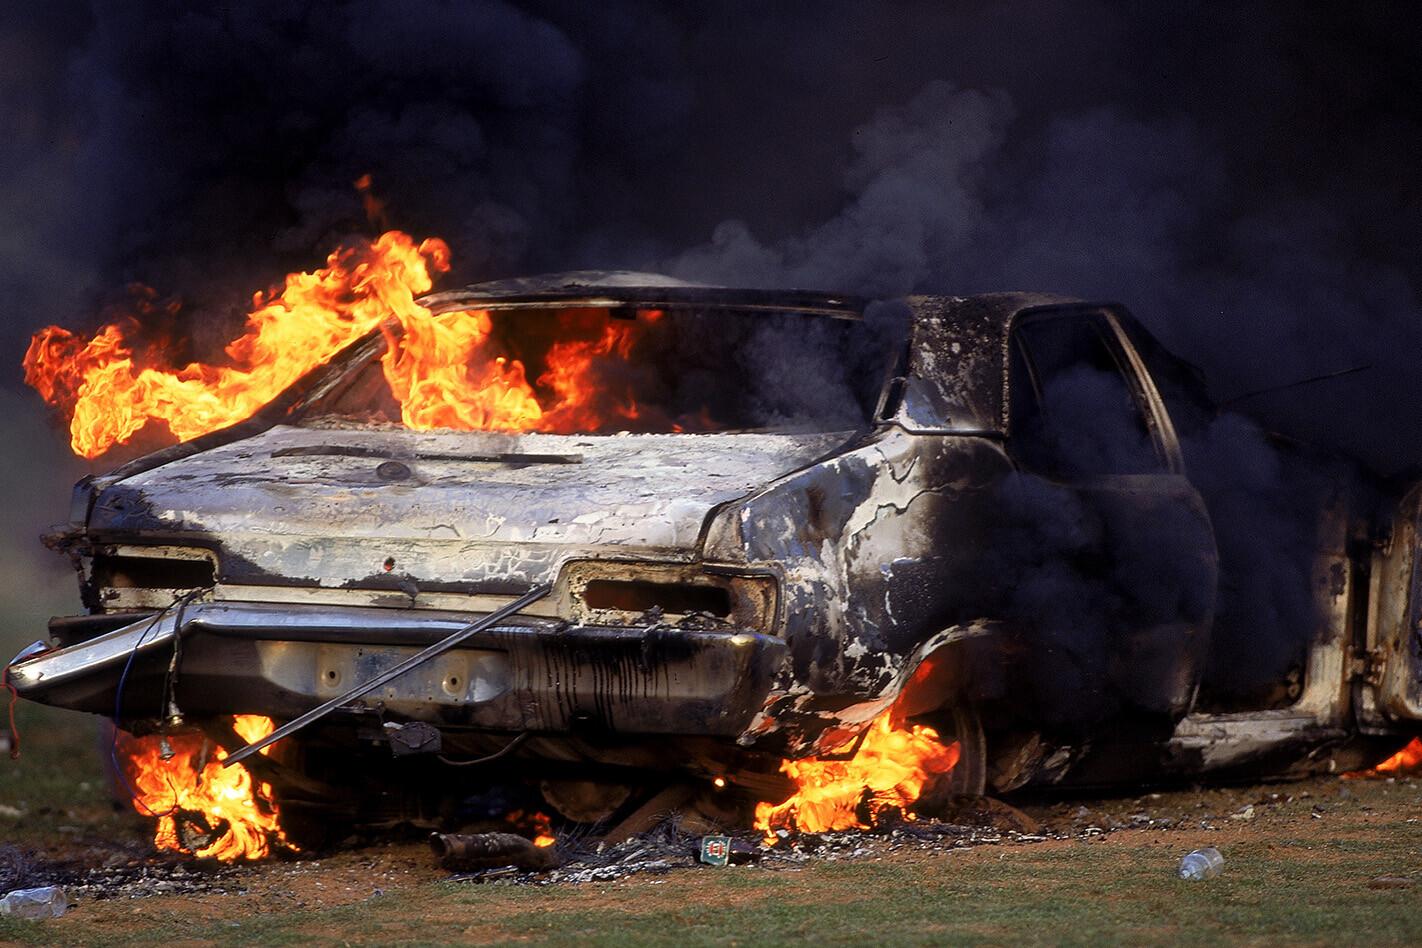 Bathurst Riots Burning Car 2 Jpg